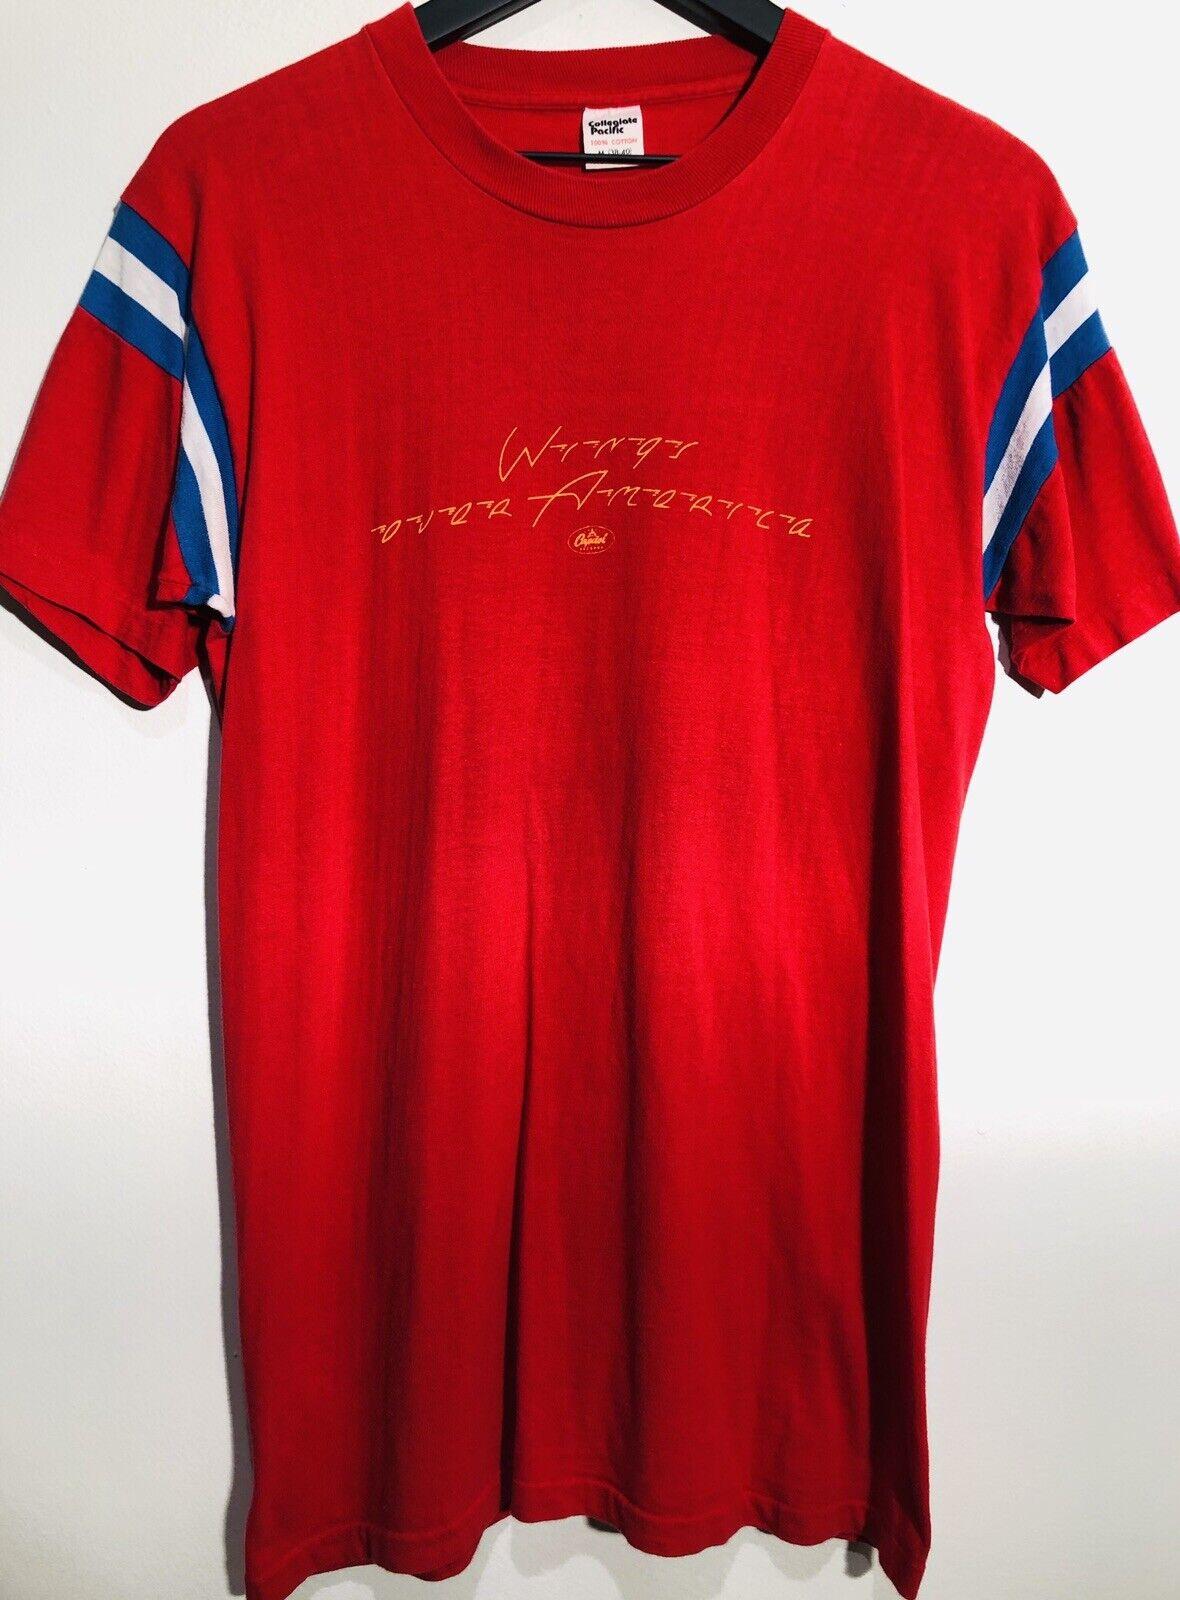 Wings Over America 1976 Paul McCartney Capitol Records Vintage T-hemd hemd